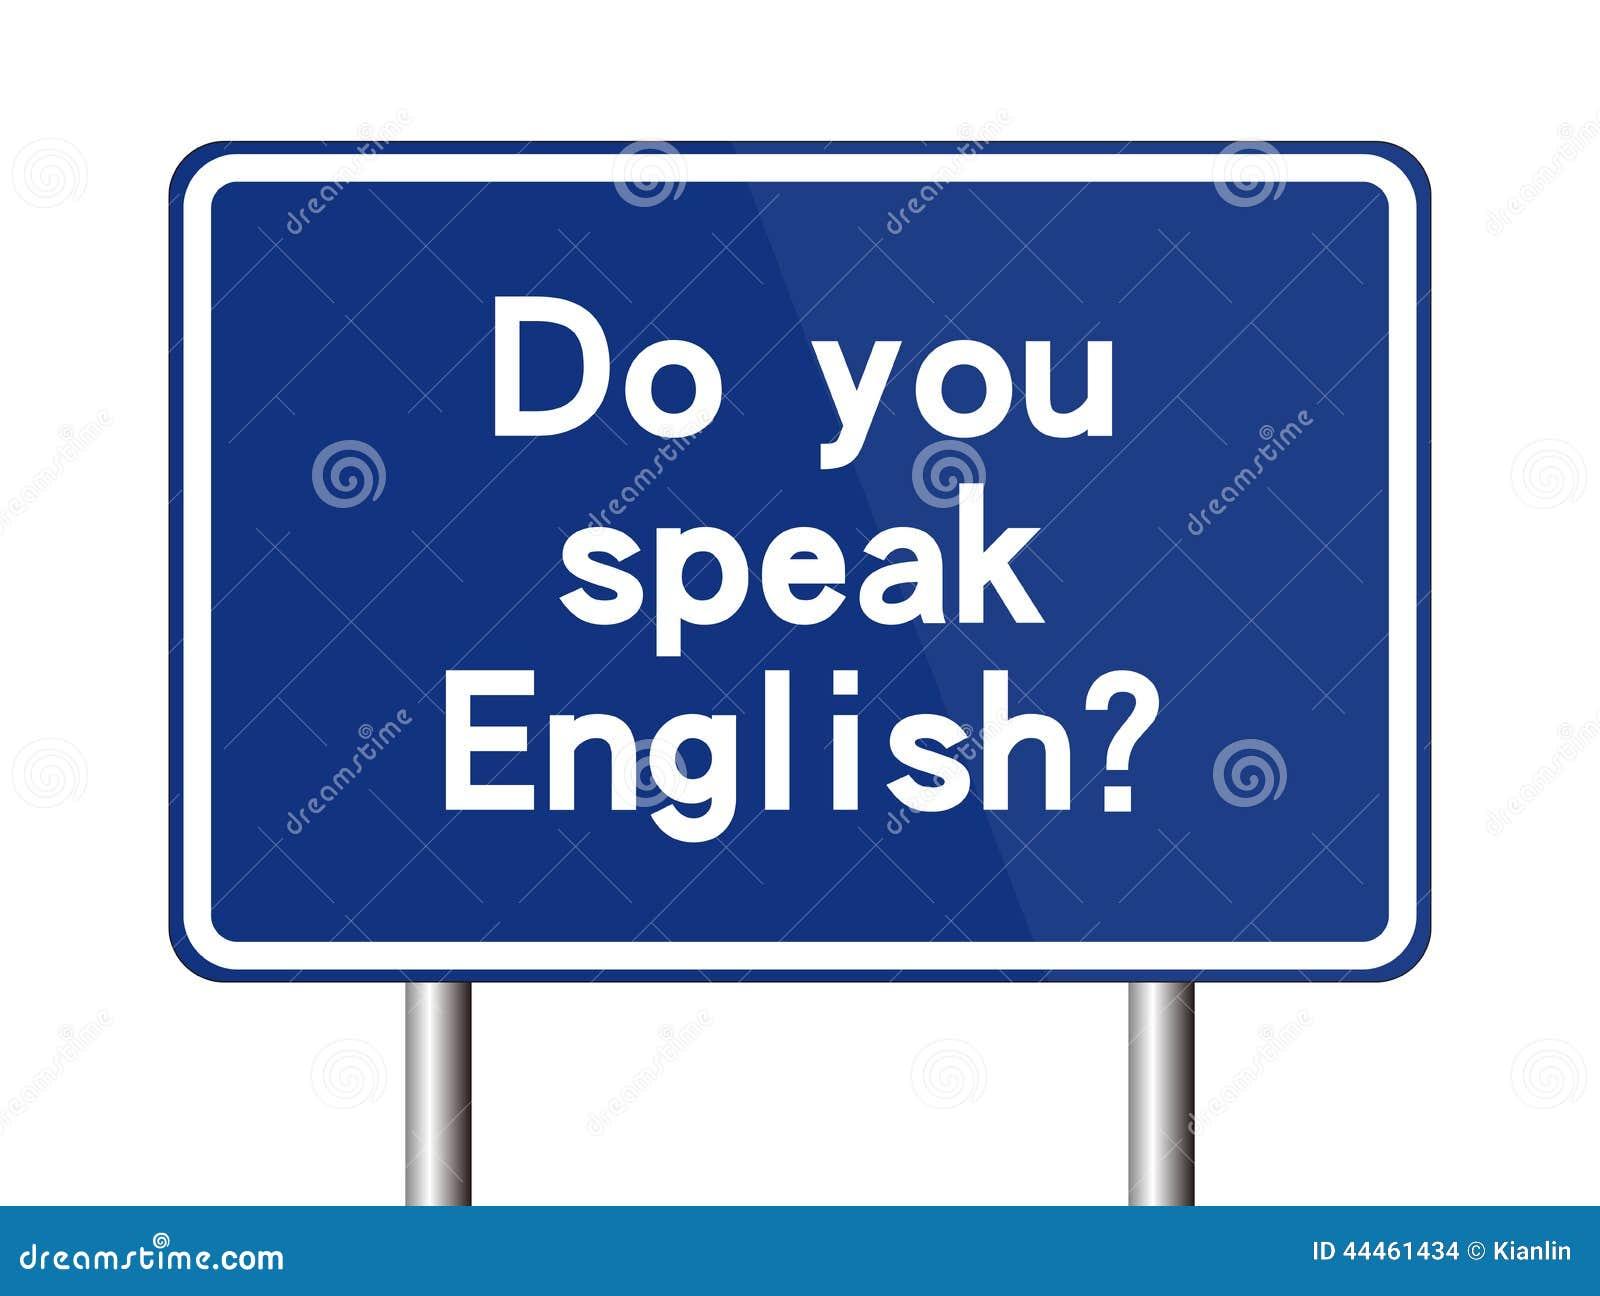 Do you speak English sign